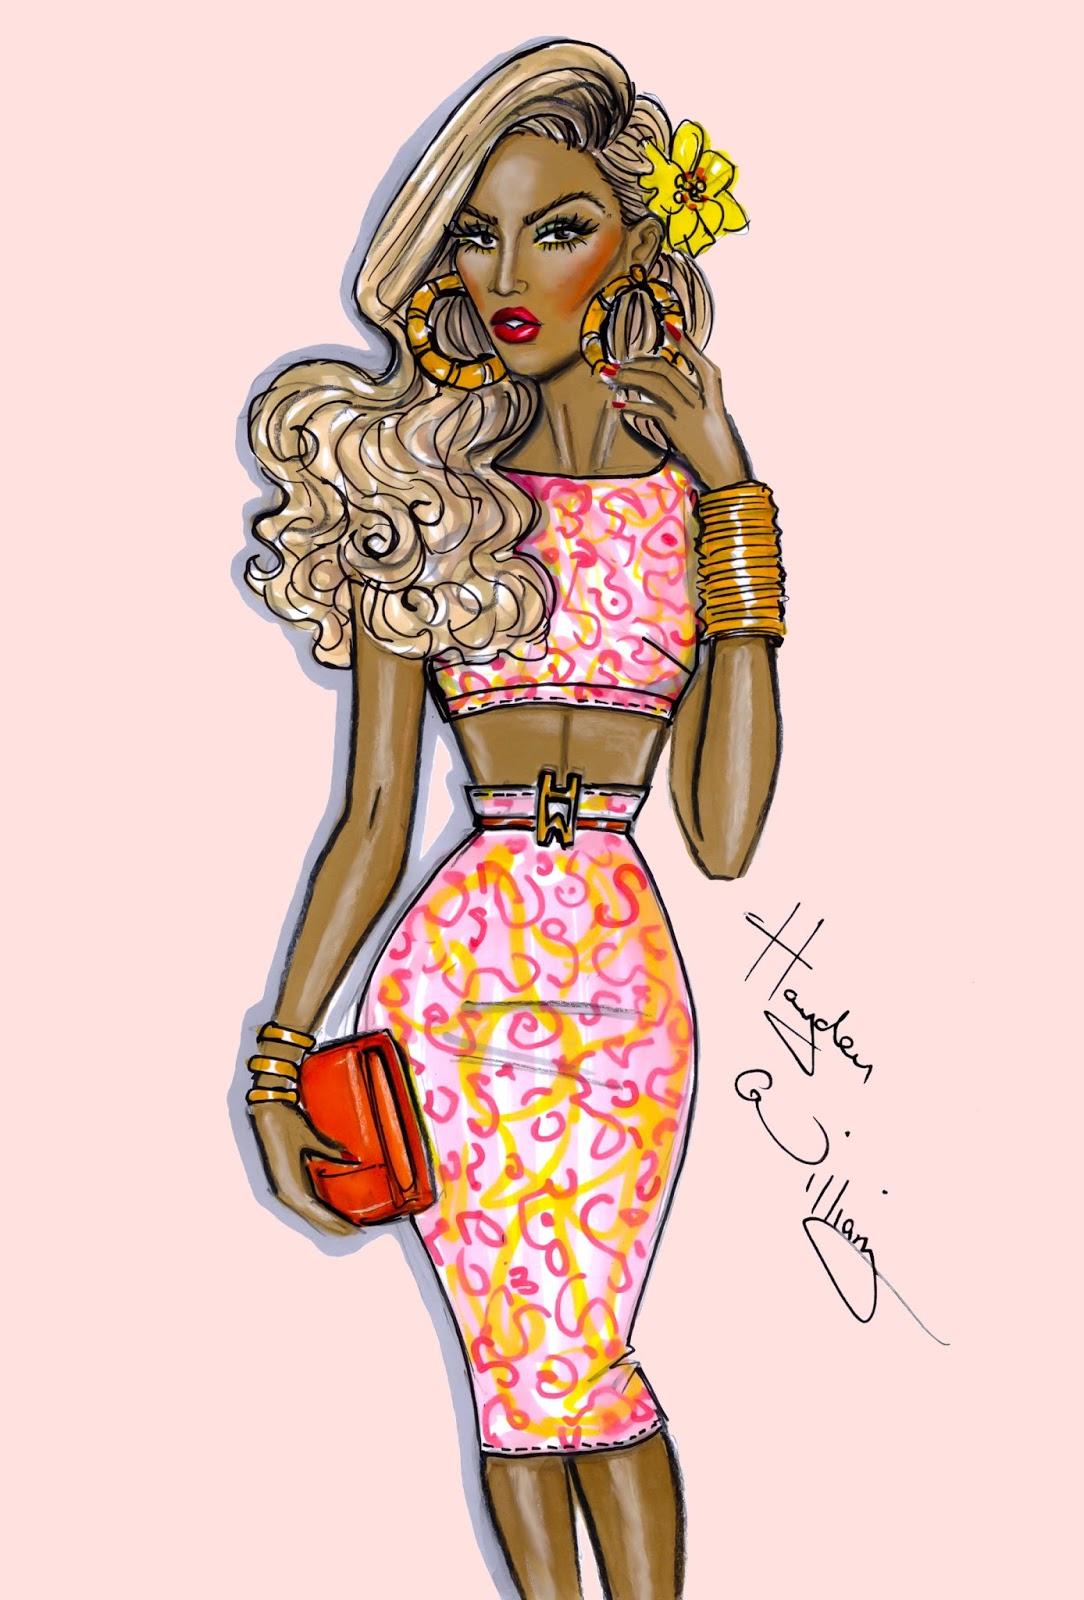 Fashion Illustration Royalty Free Stock Photo: Hayden Williams Fashion Illustrations: June 2013